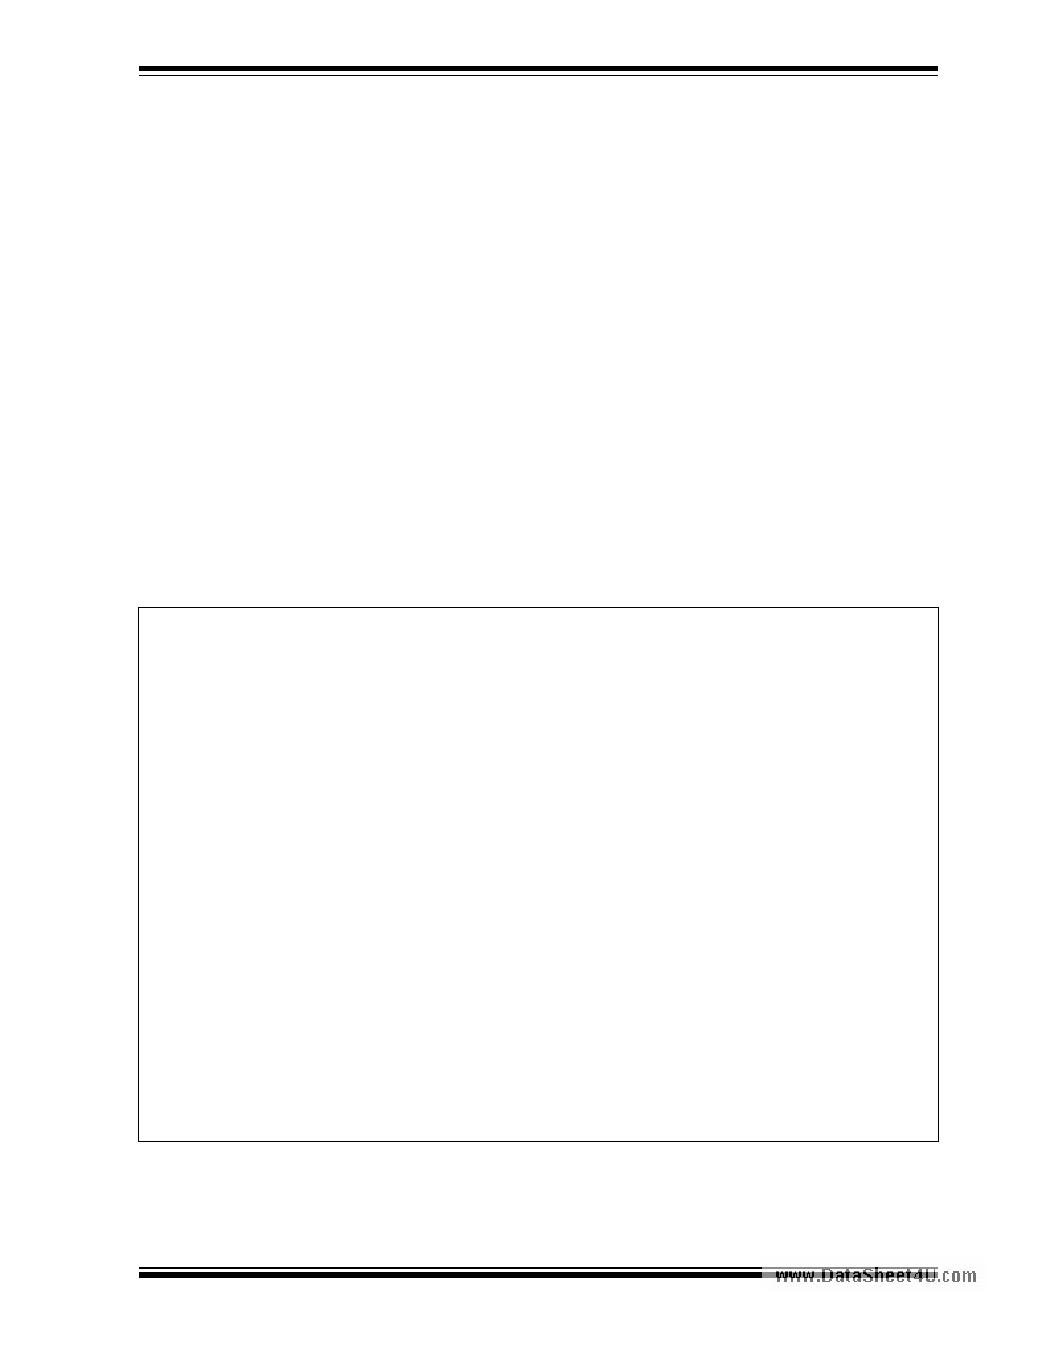 12c509a datasheet